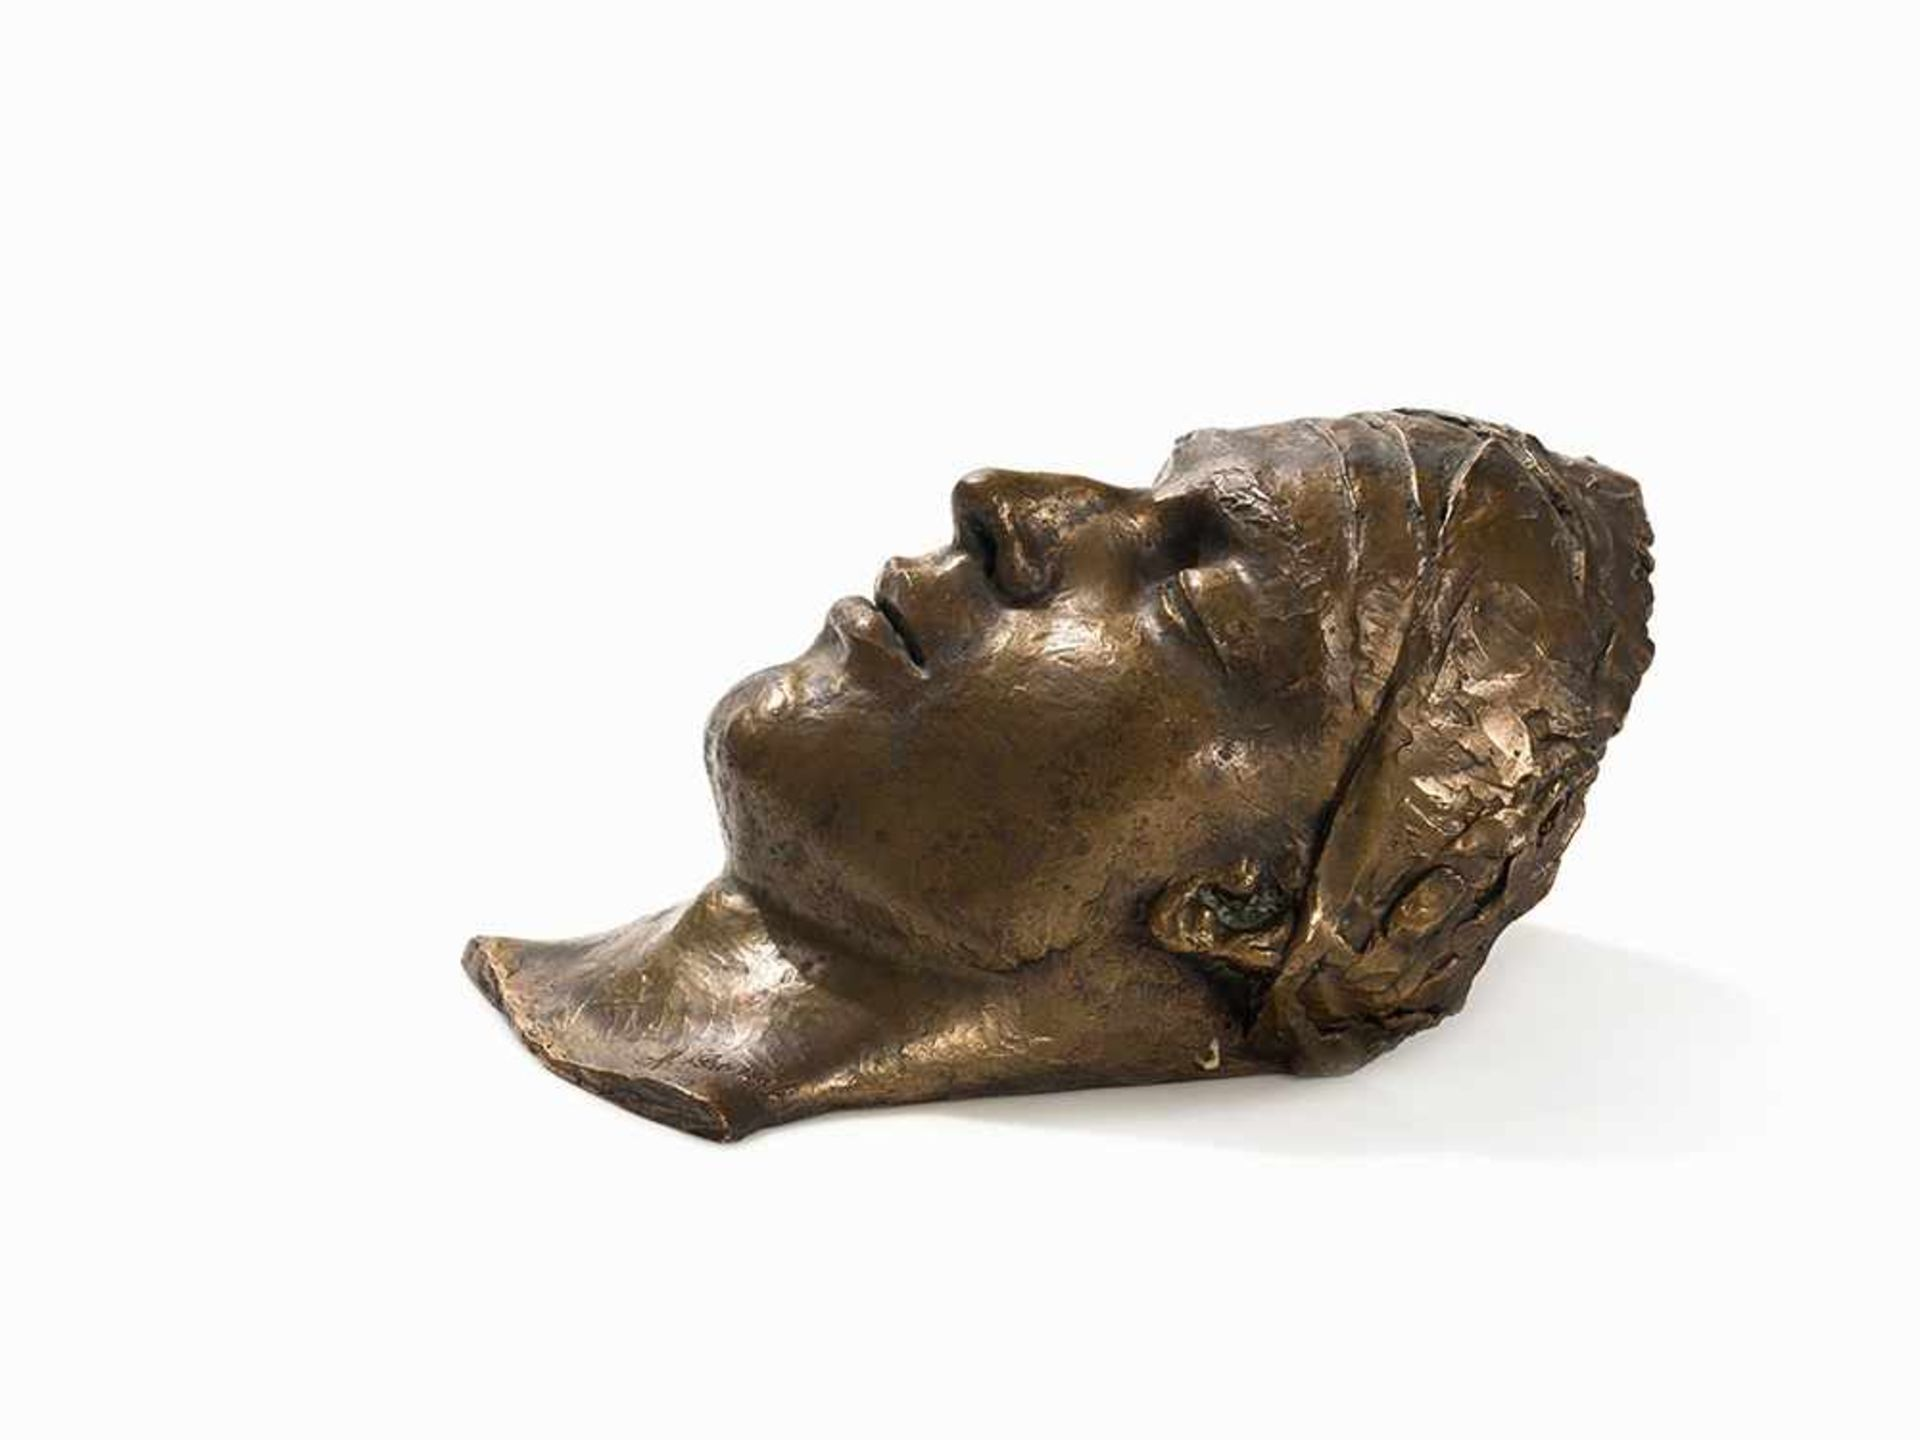 Los 92 - Manolo Pascual (1902-1983), Junger Mann (Totenmaske), 20. Jh. Bronze, patiniert. Wohl USA, 2. Hälfte